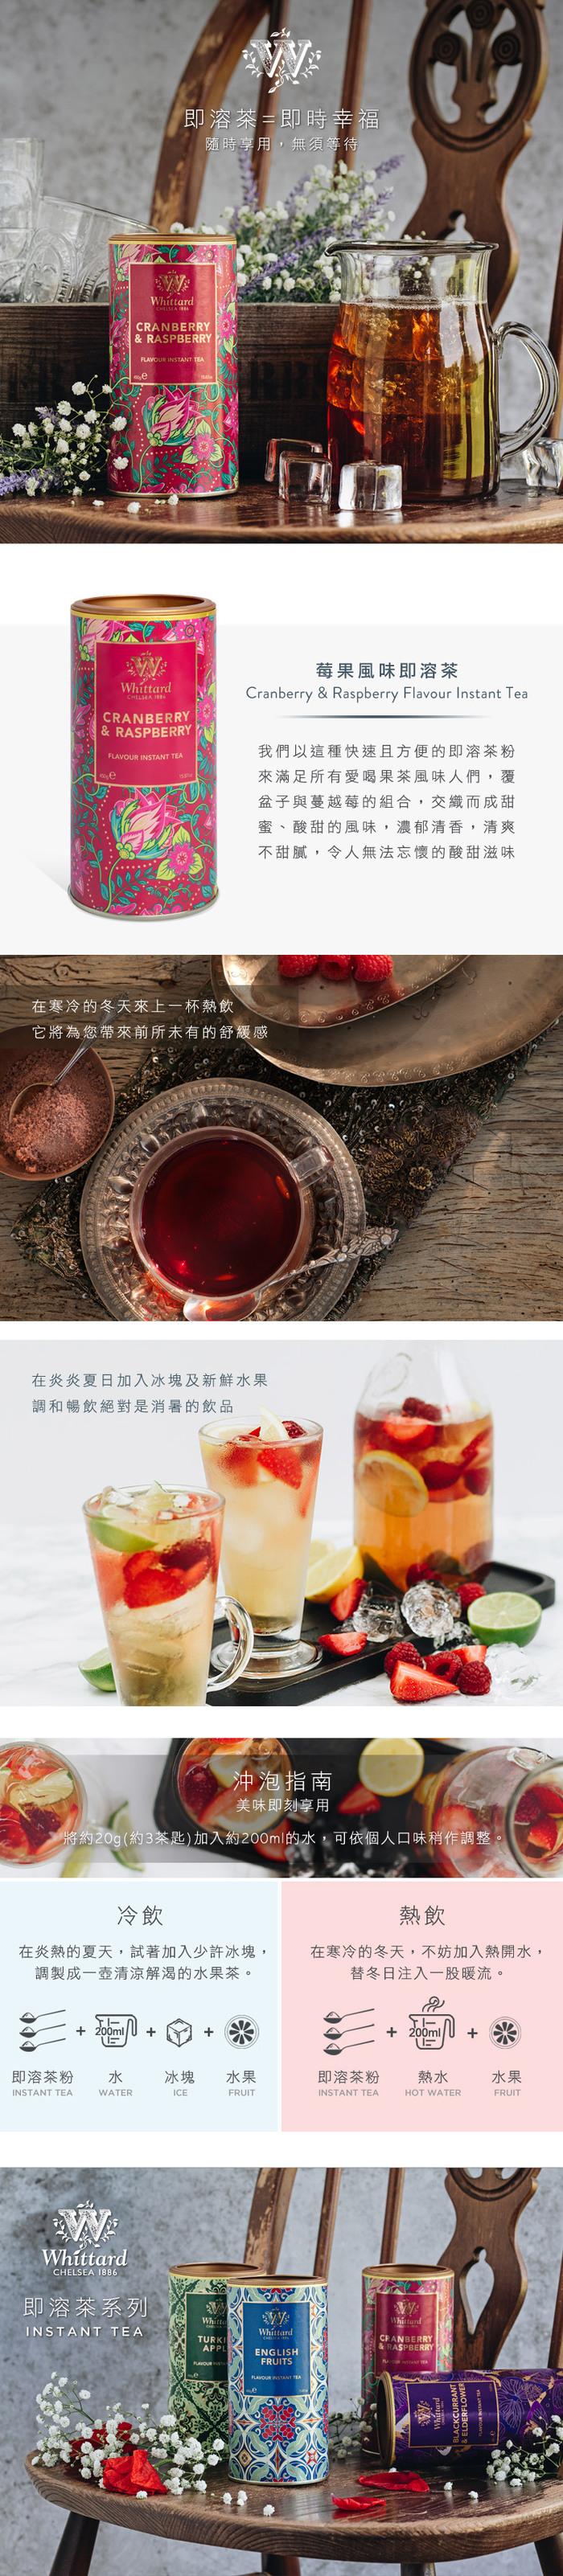 Whittard | 莓果風味即溶茶